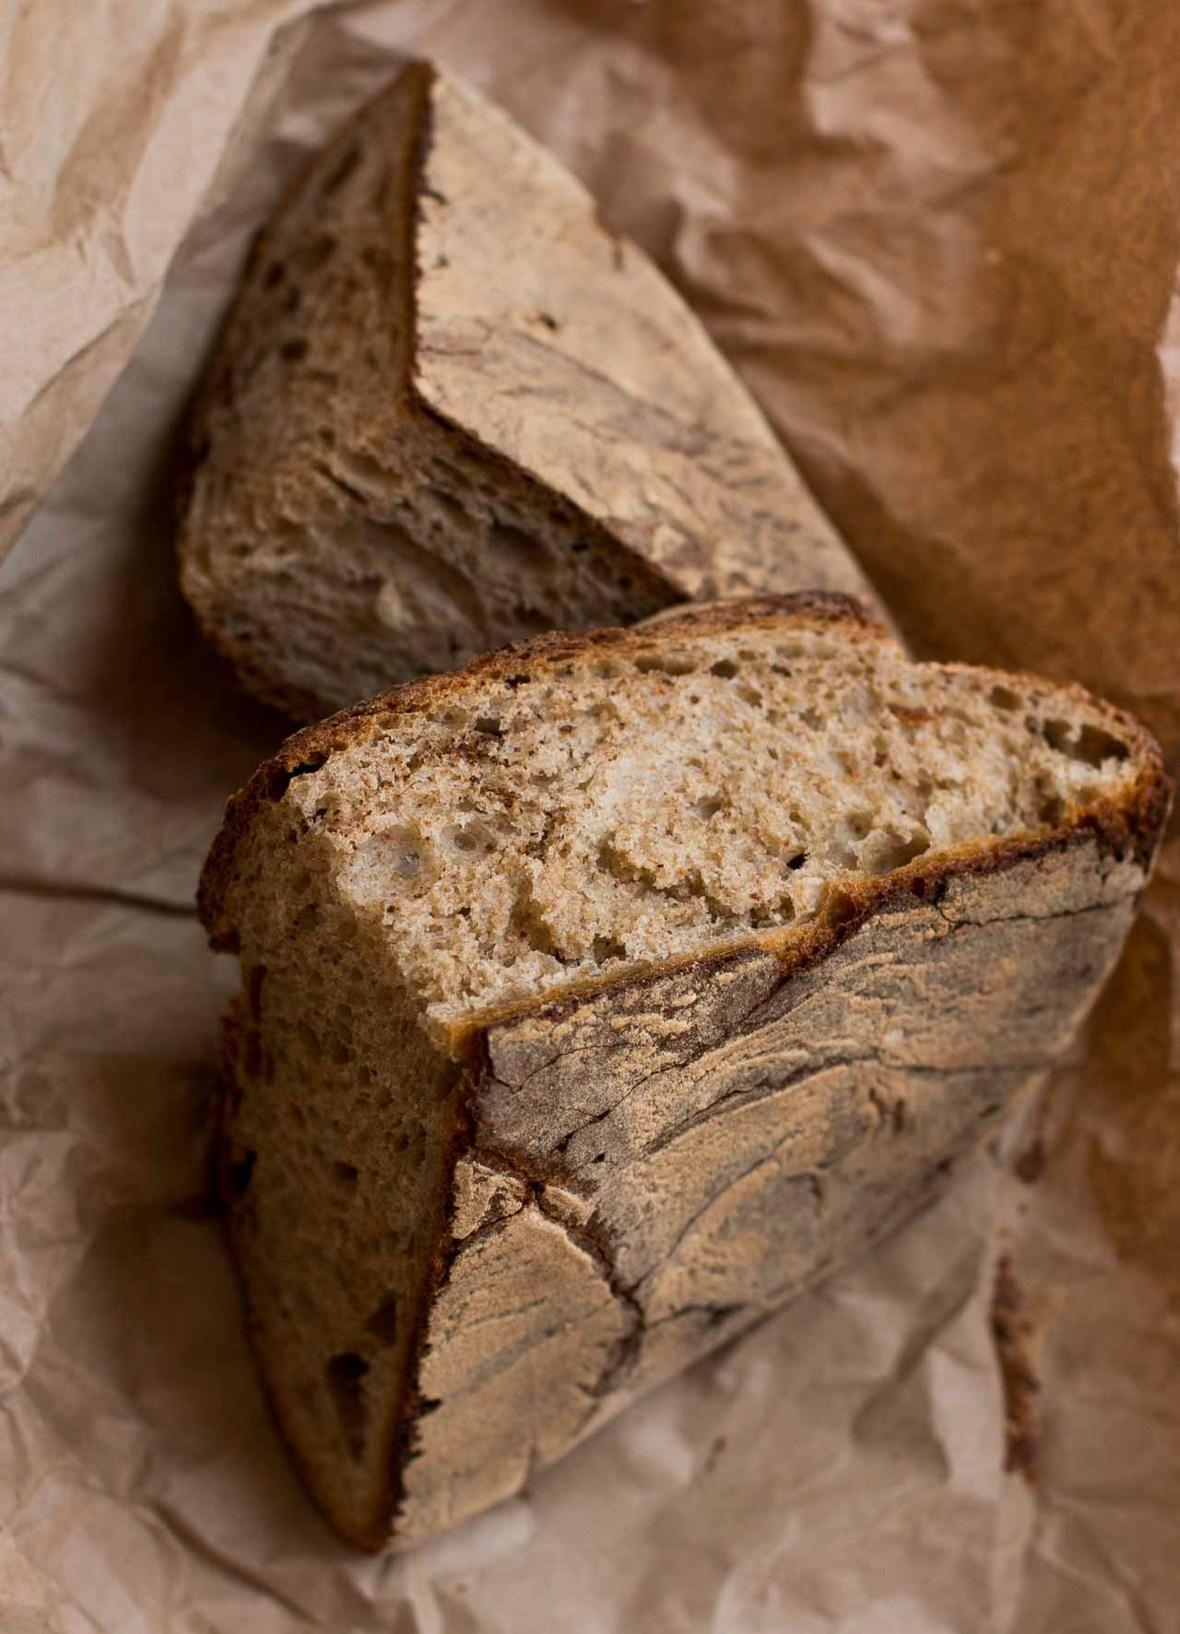 bien cuit bread